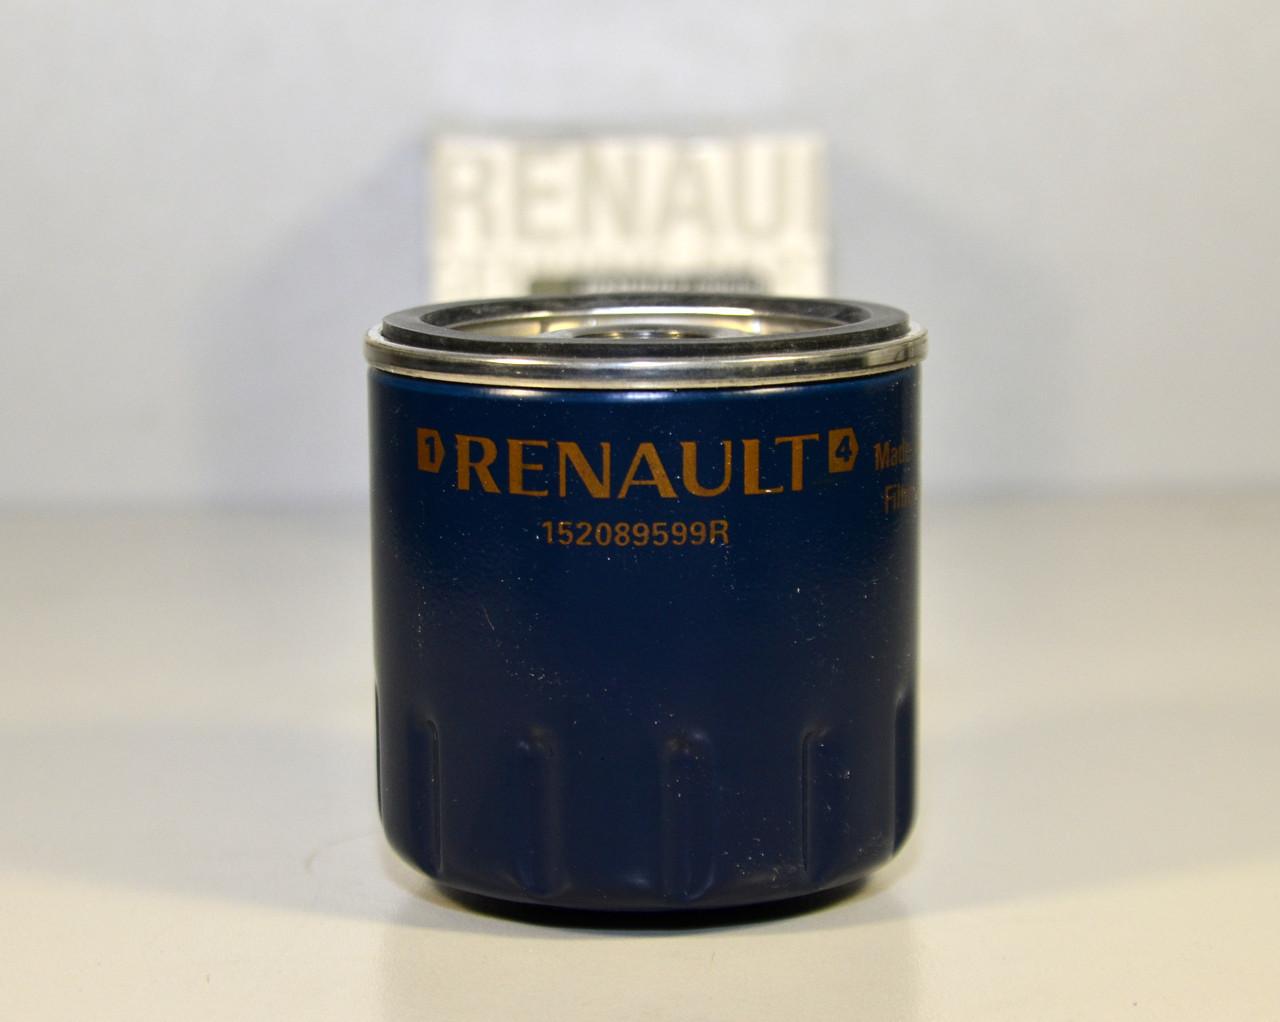 Фільтр масла на Renault Scenic IV - Renault (Оригінал) - 152089599R